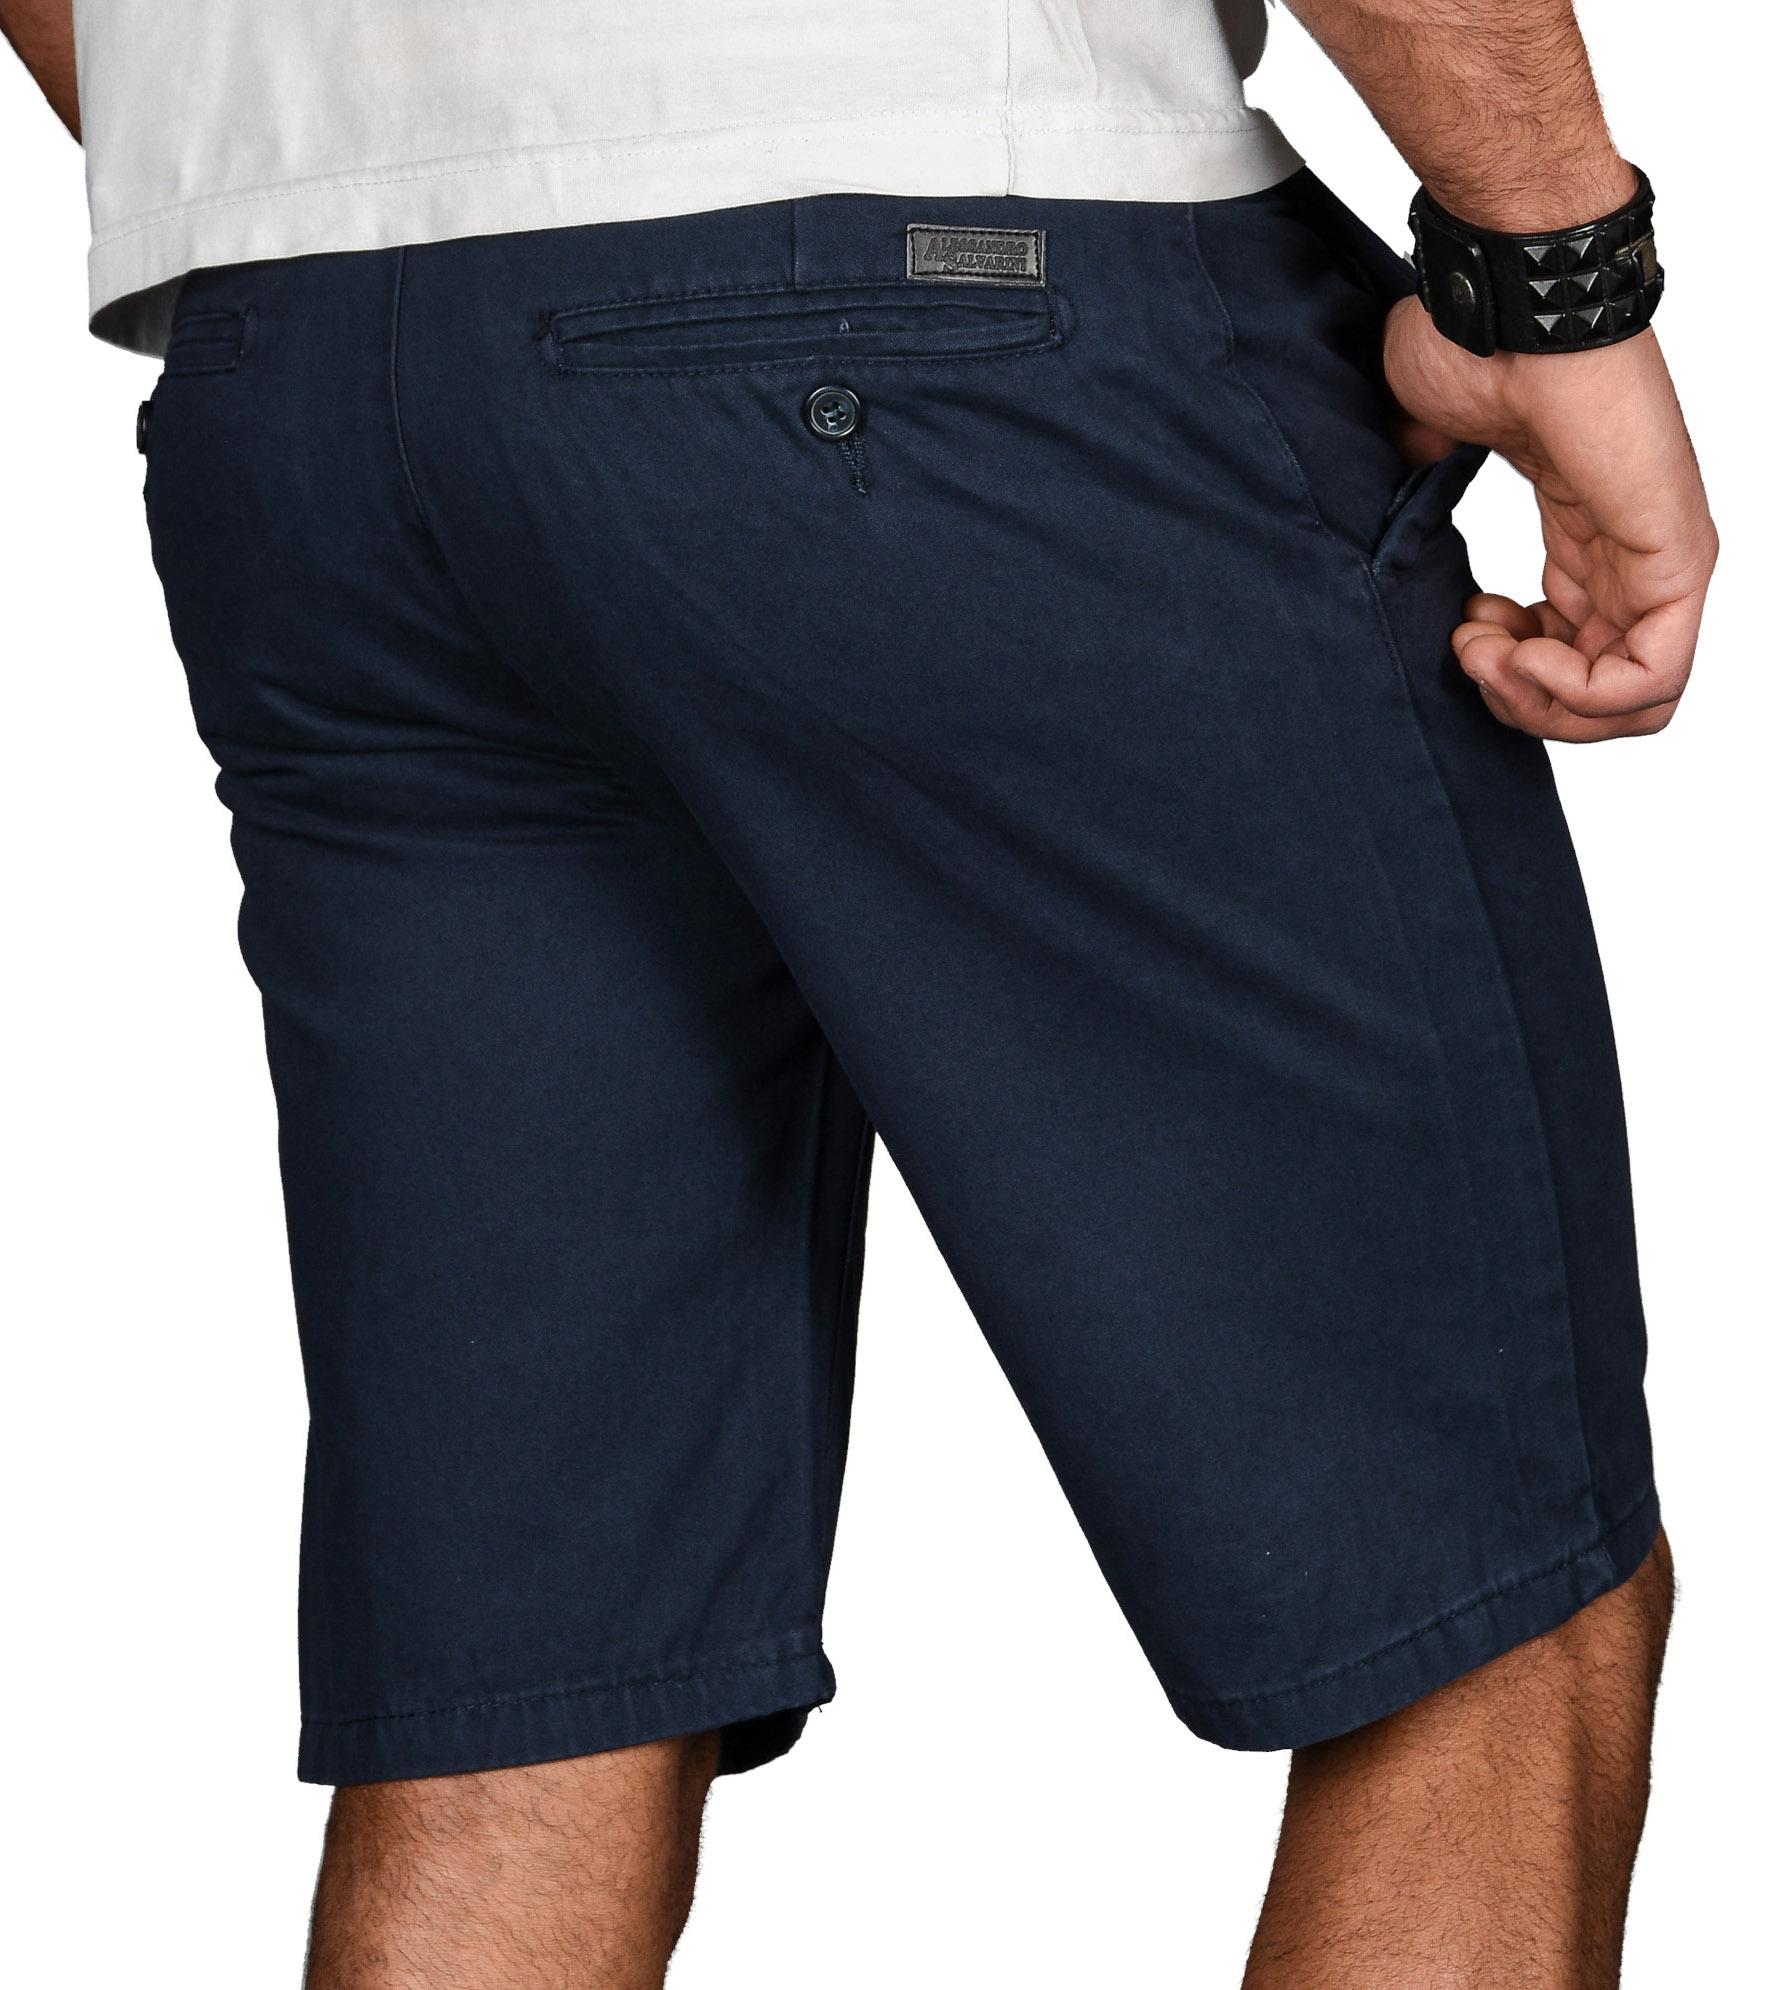 A-Salvarini-Herren-Shorts-kurze-Sommer-Hose-mit-Guertel-Short-Bermuda-NEU-AS096 Indexbild 10